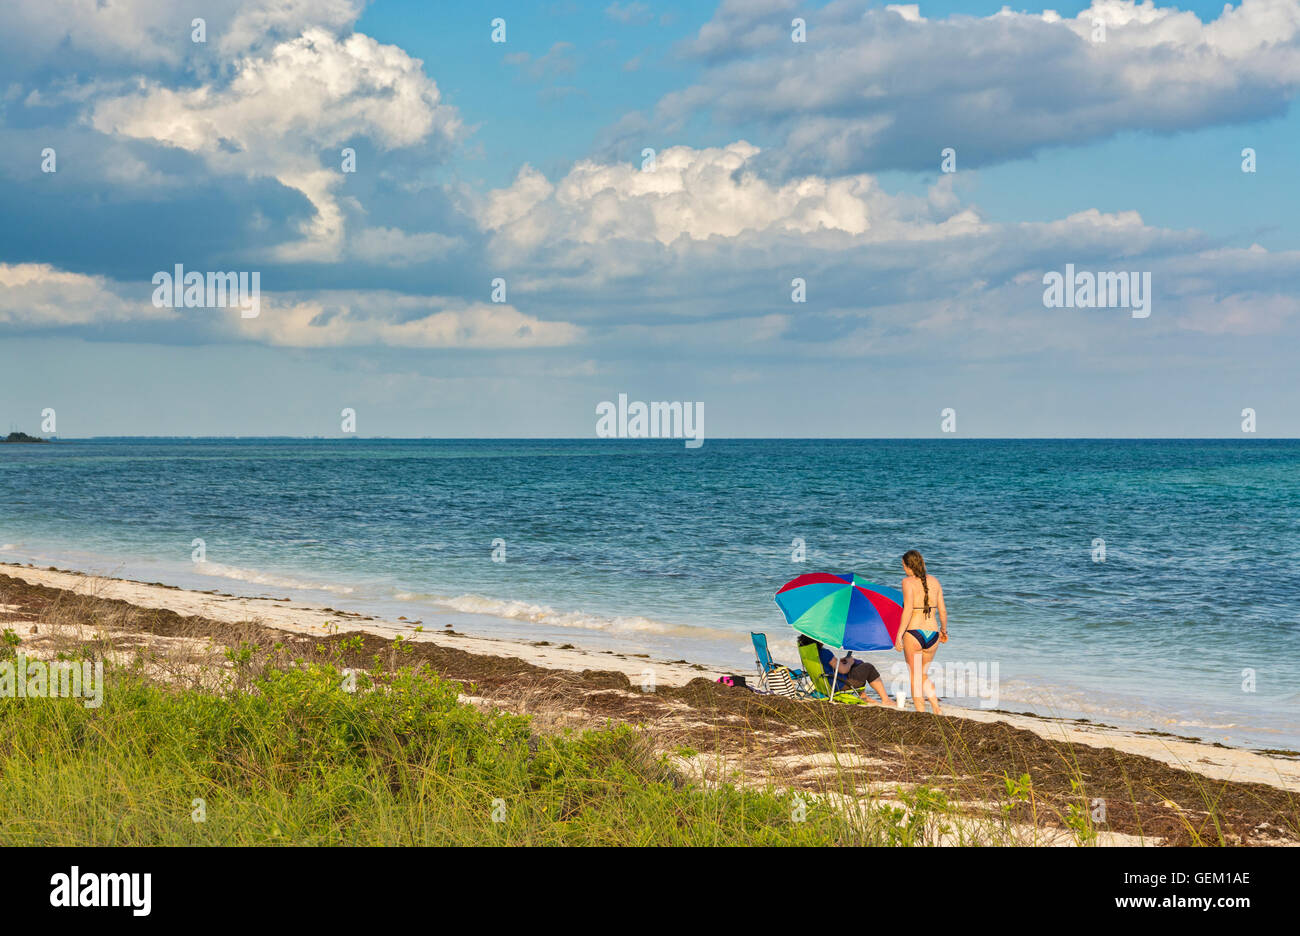 Florida, Bahia Honda State Park, Seagrass on beach, umbrella, woman, bikini - Stock Image